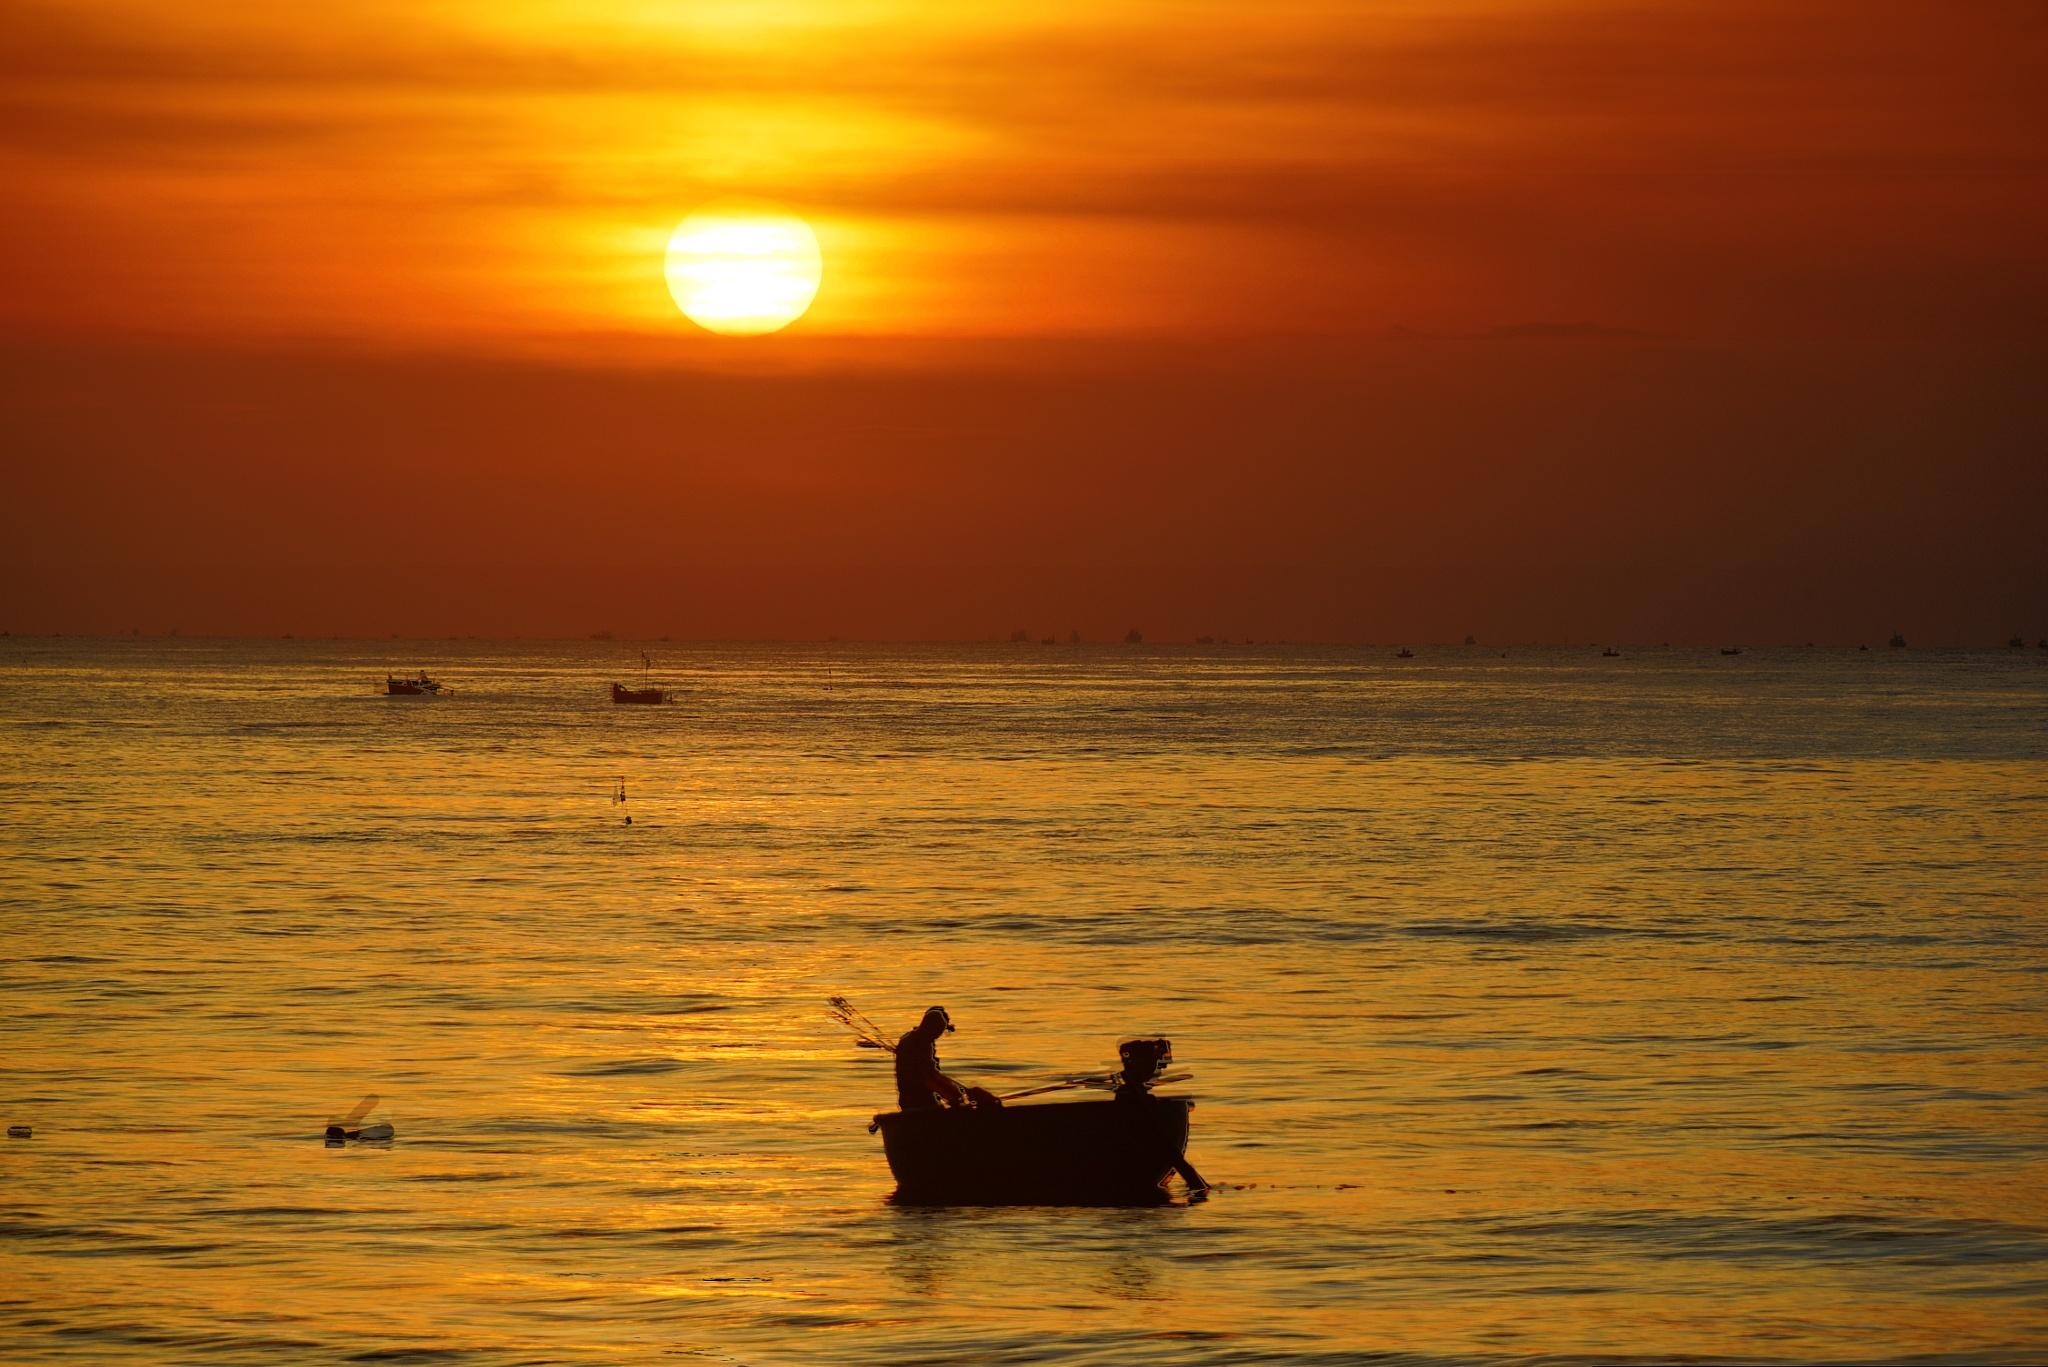 sunrise at Doi Duong by lequangchi